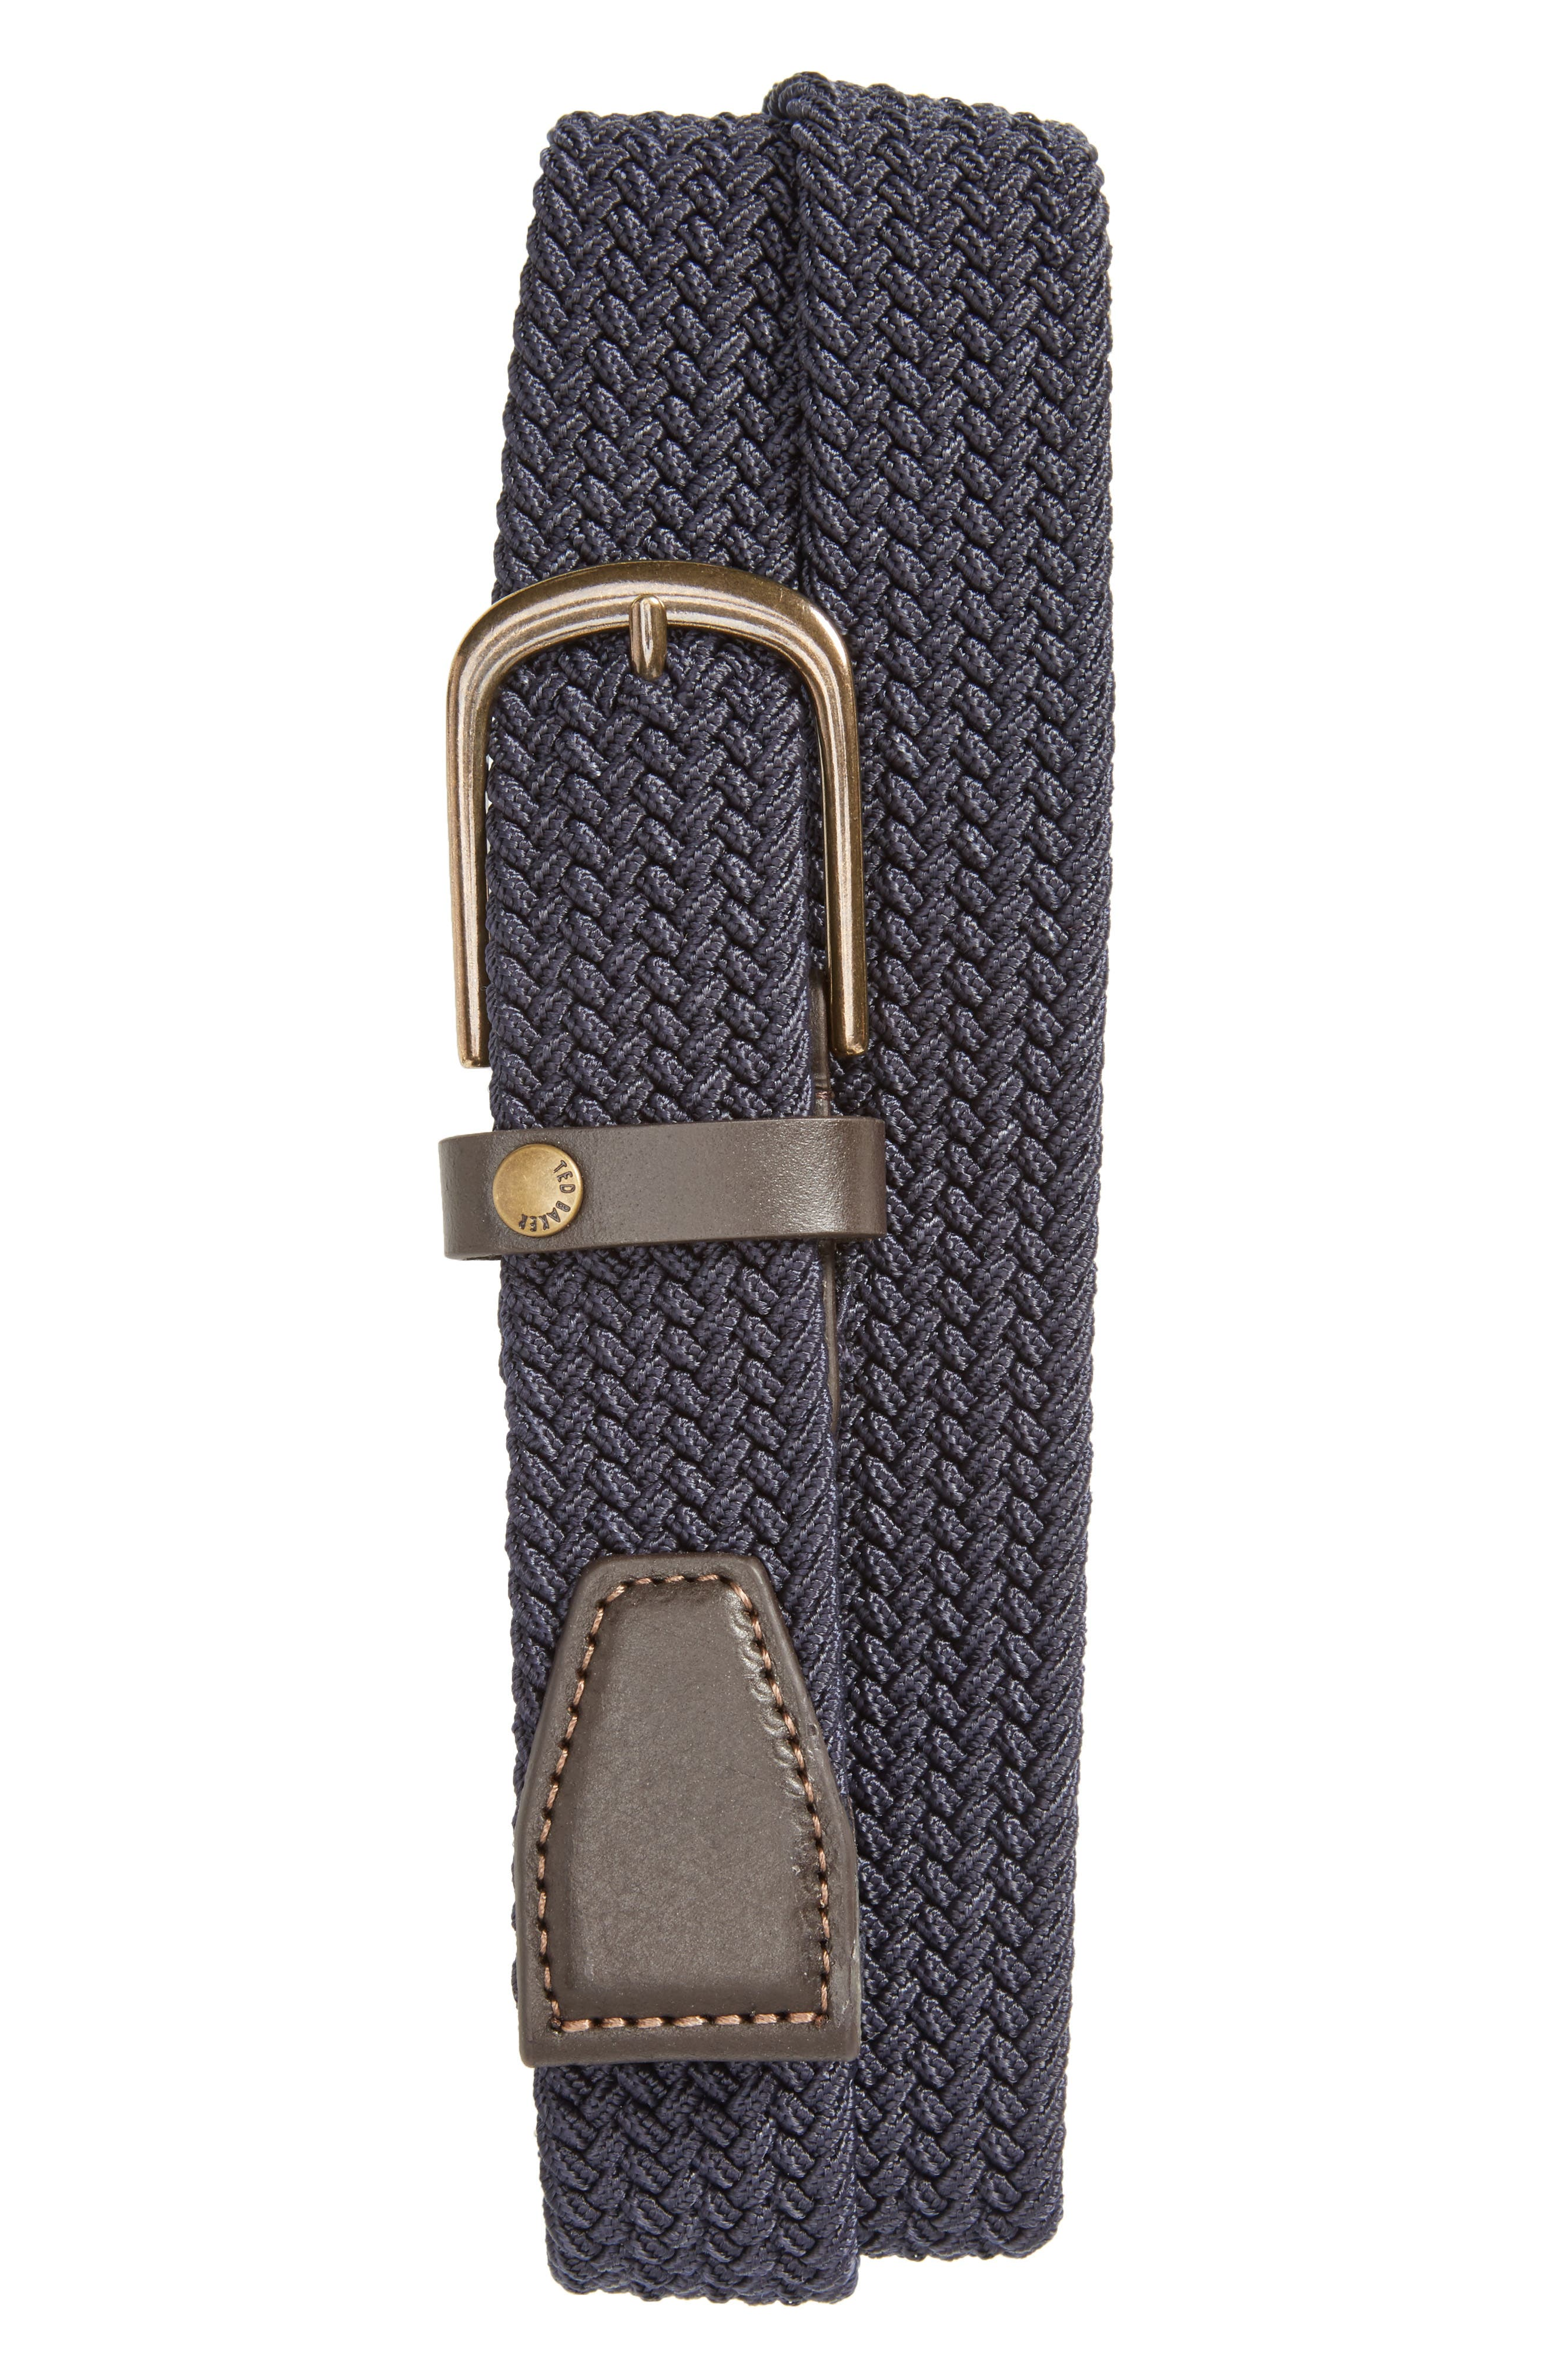 Alternate Image 1 Selected - Ted Baker London Gerbera Marled Woven Stretch Belt